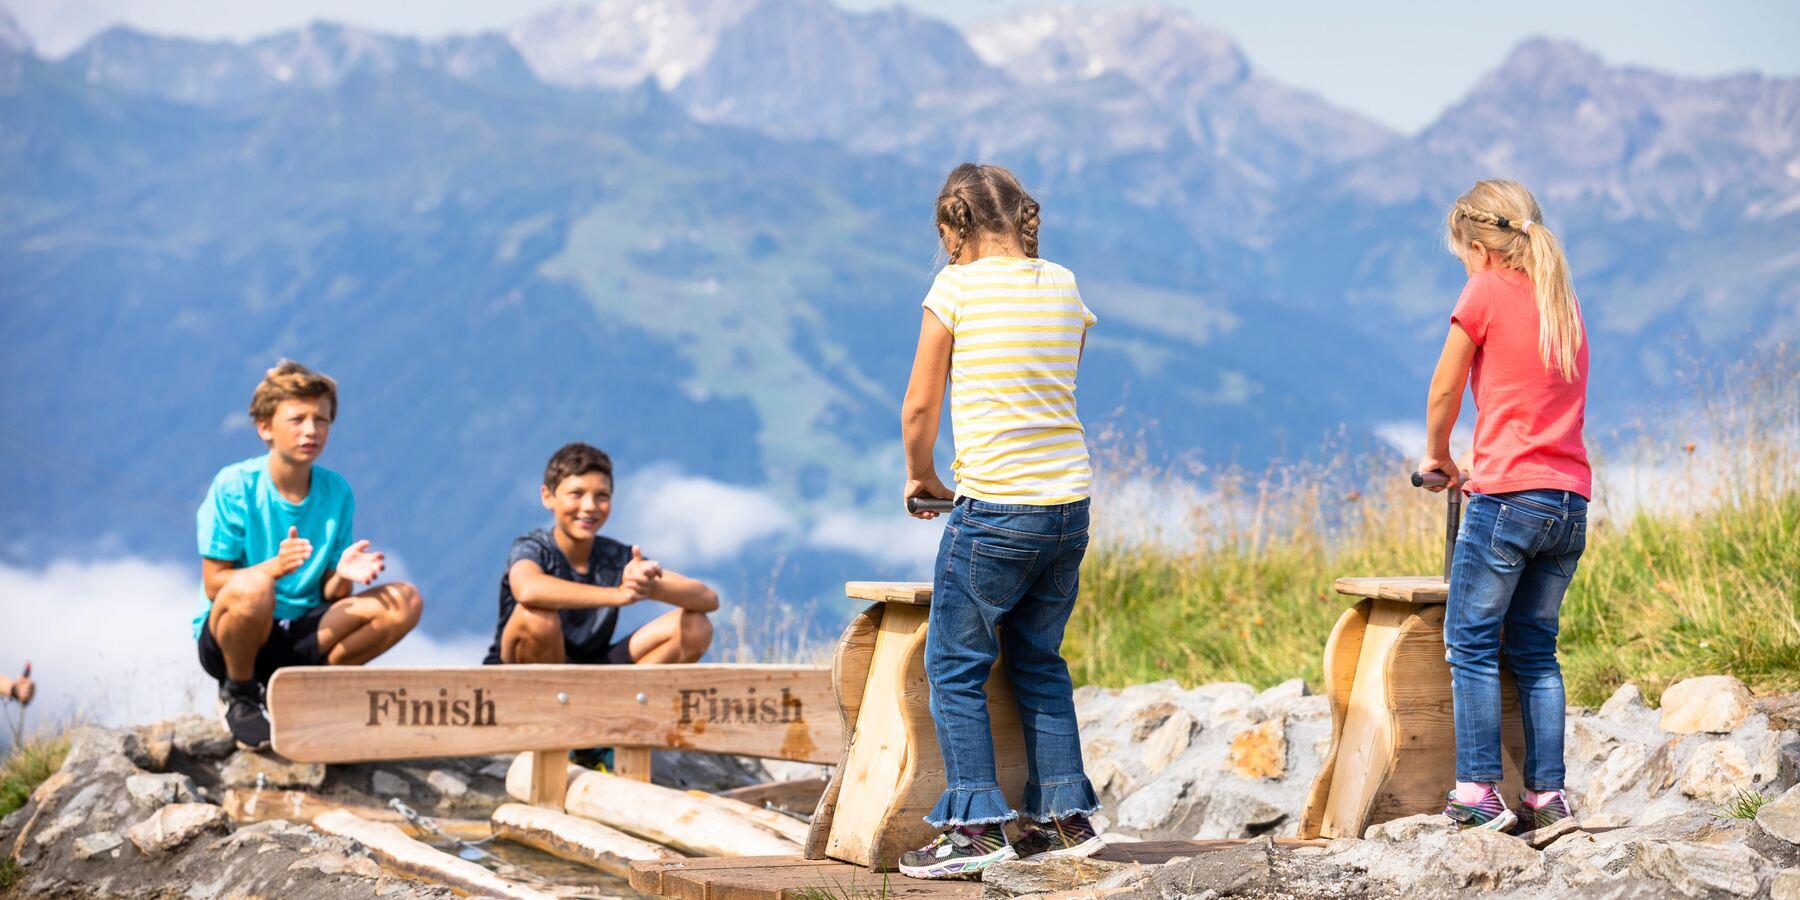 Mountainbiken in Vorarlberg im Montafon | intertecinc.com